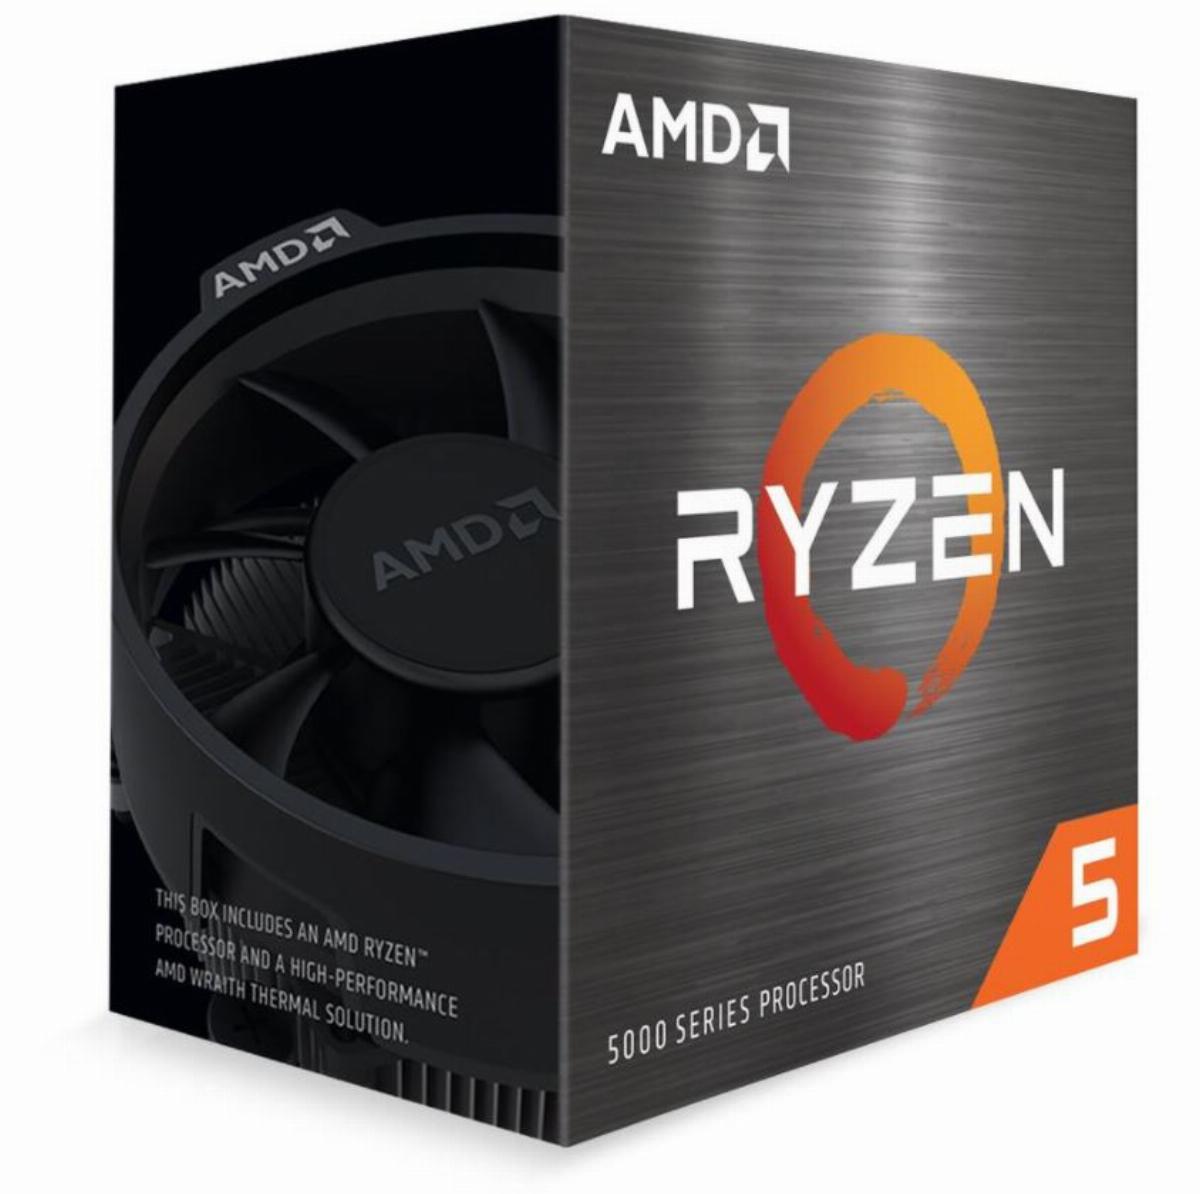 Процесор AMD Ryzen 5 5600X (4.6GHz Max Boost,35MB,65W,AM4) box